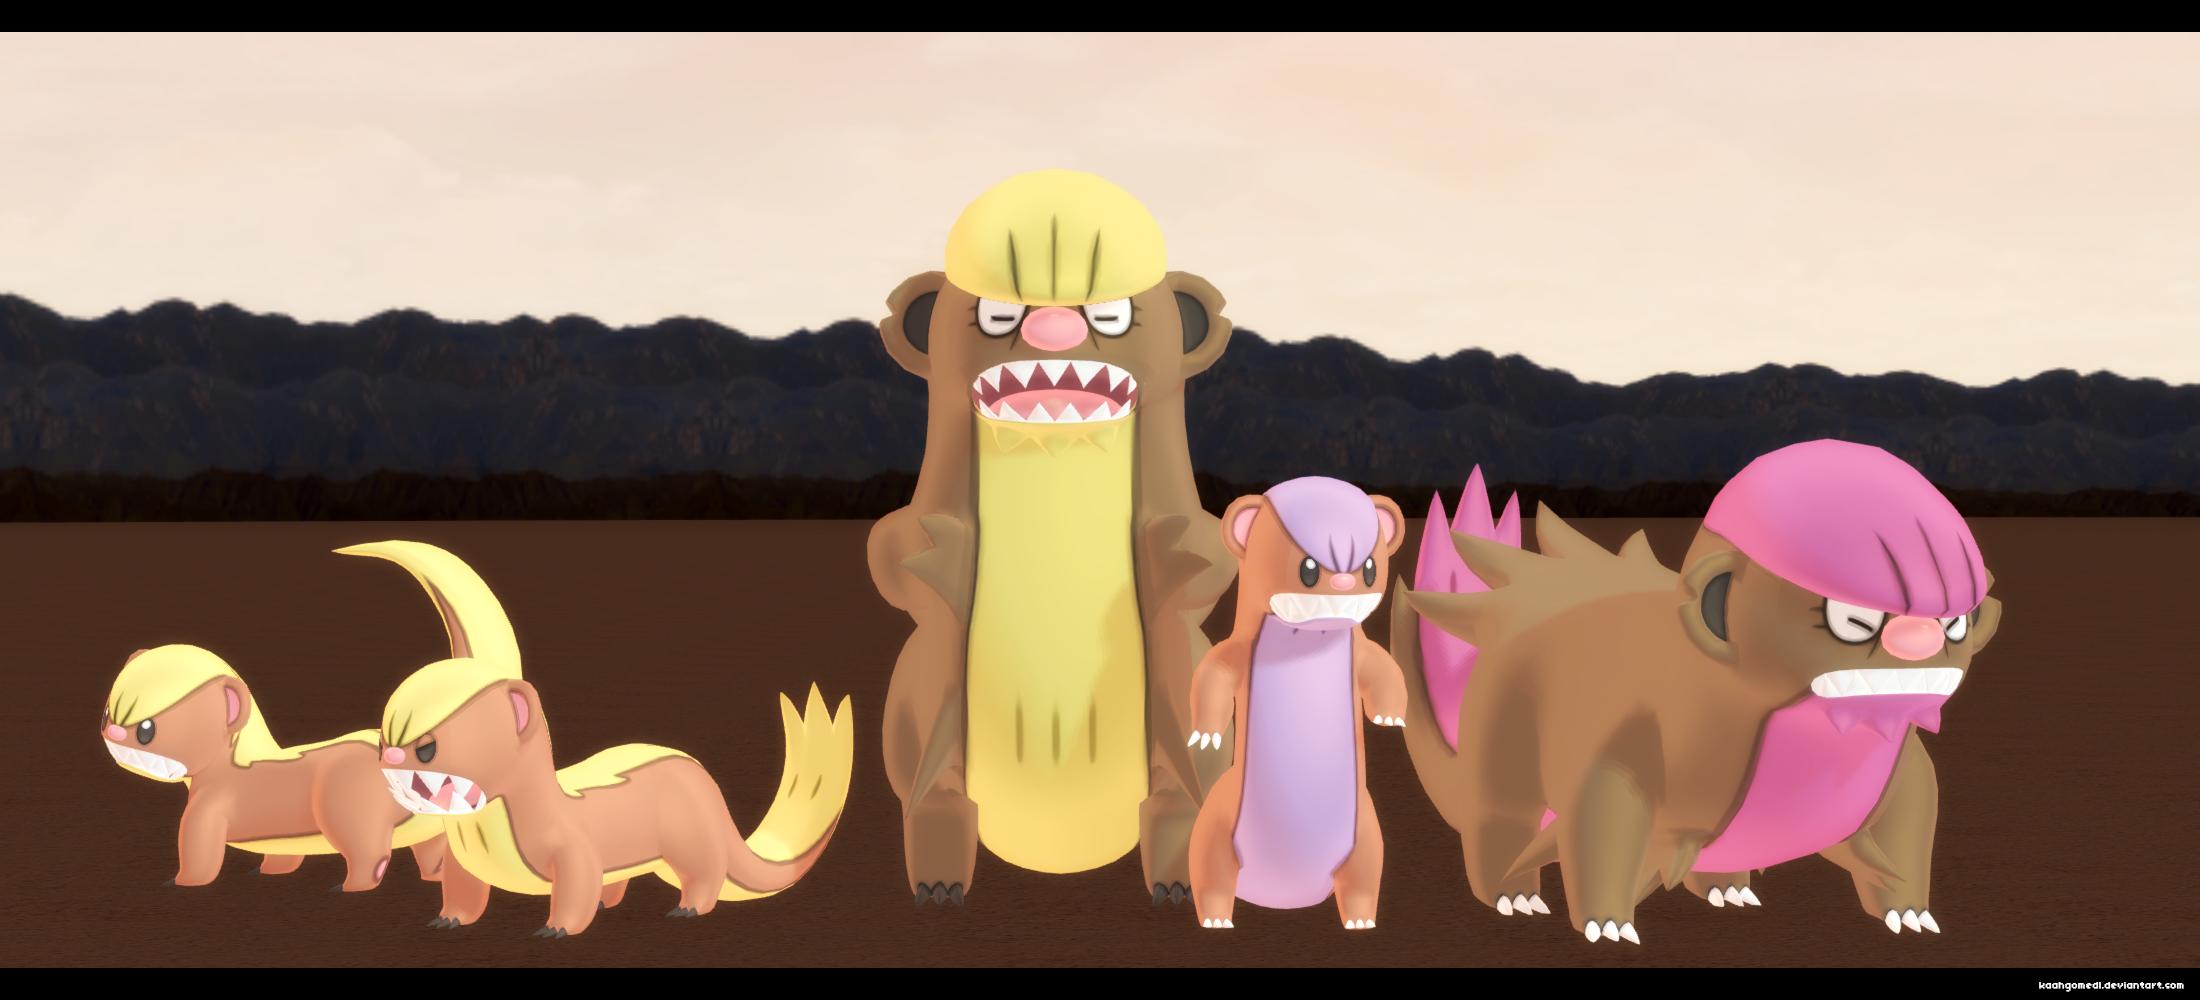 MMD Pokemon: Gumshoos Youngoos